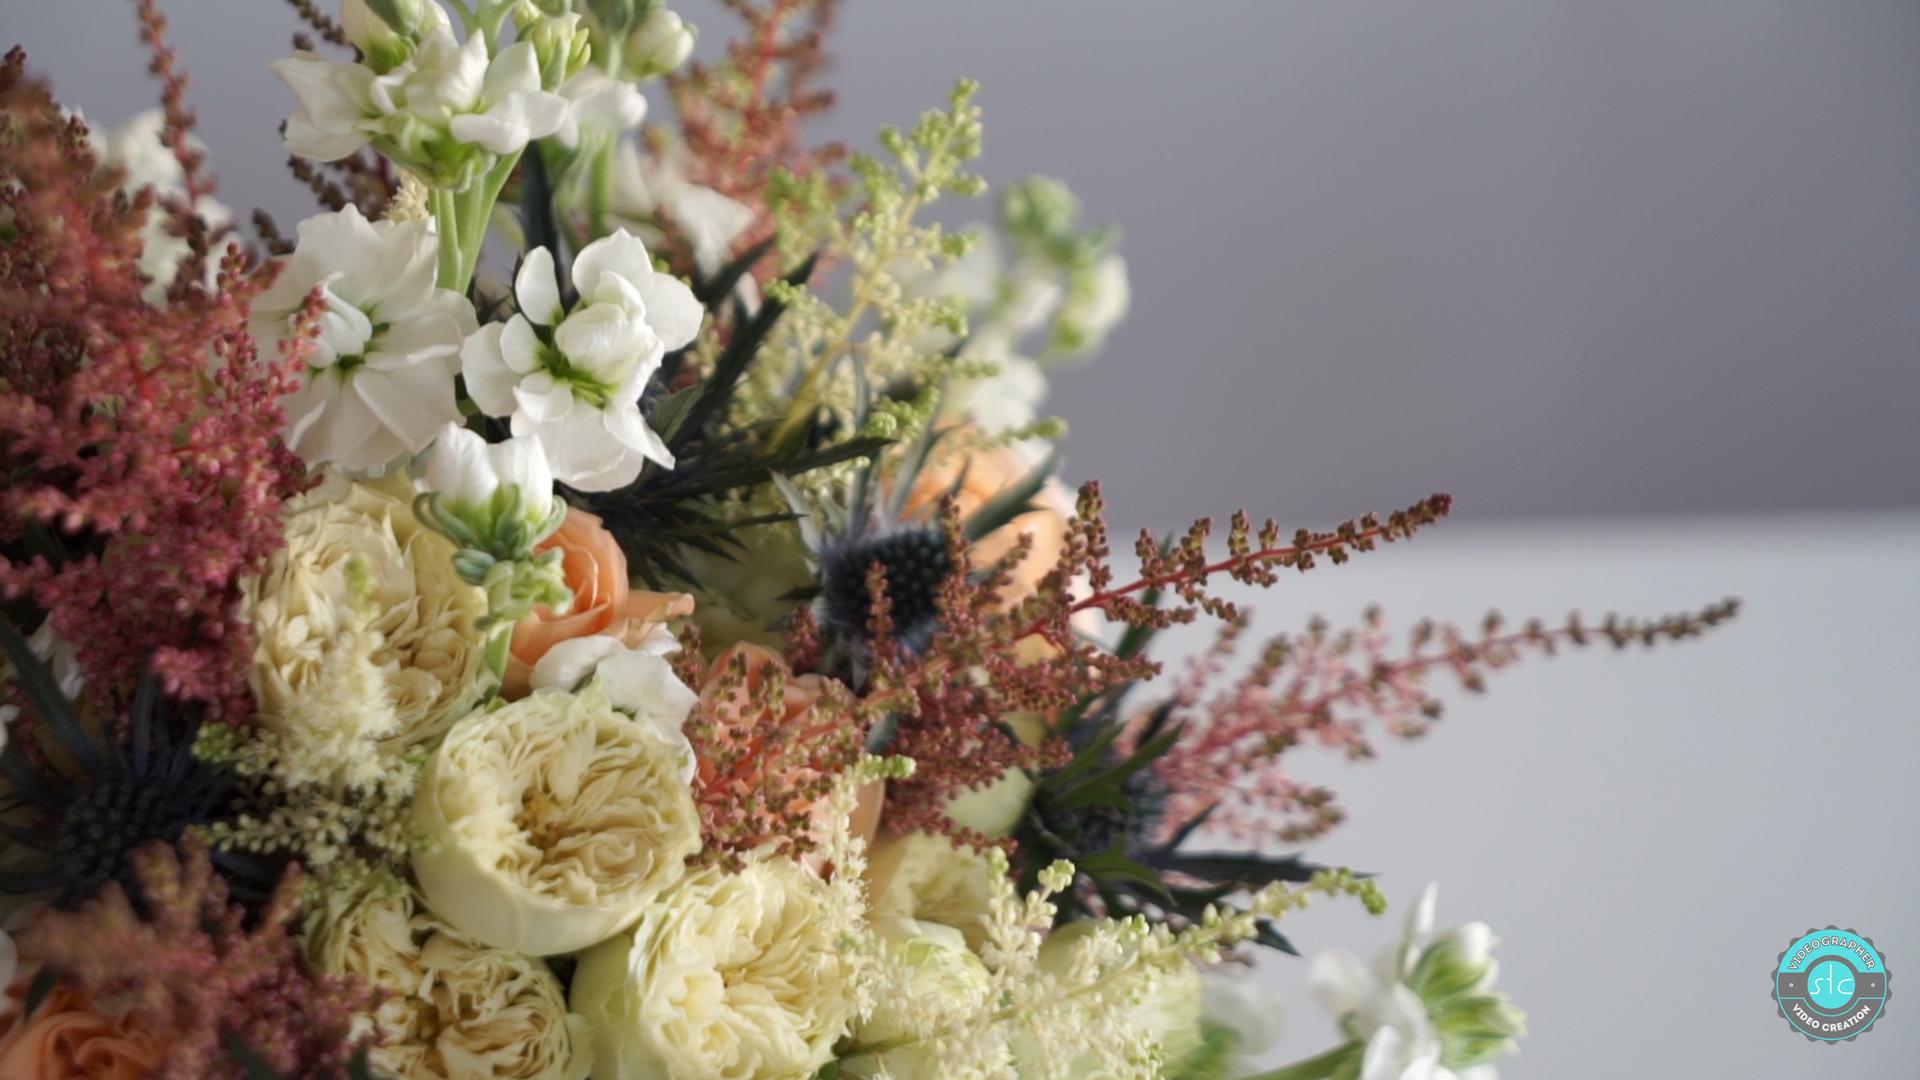 stc-videographer-ramo-novia-bouquet-bride-flores